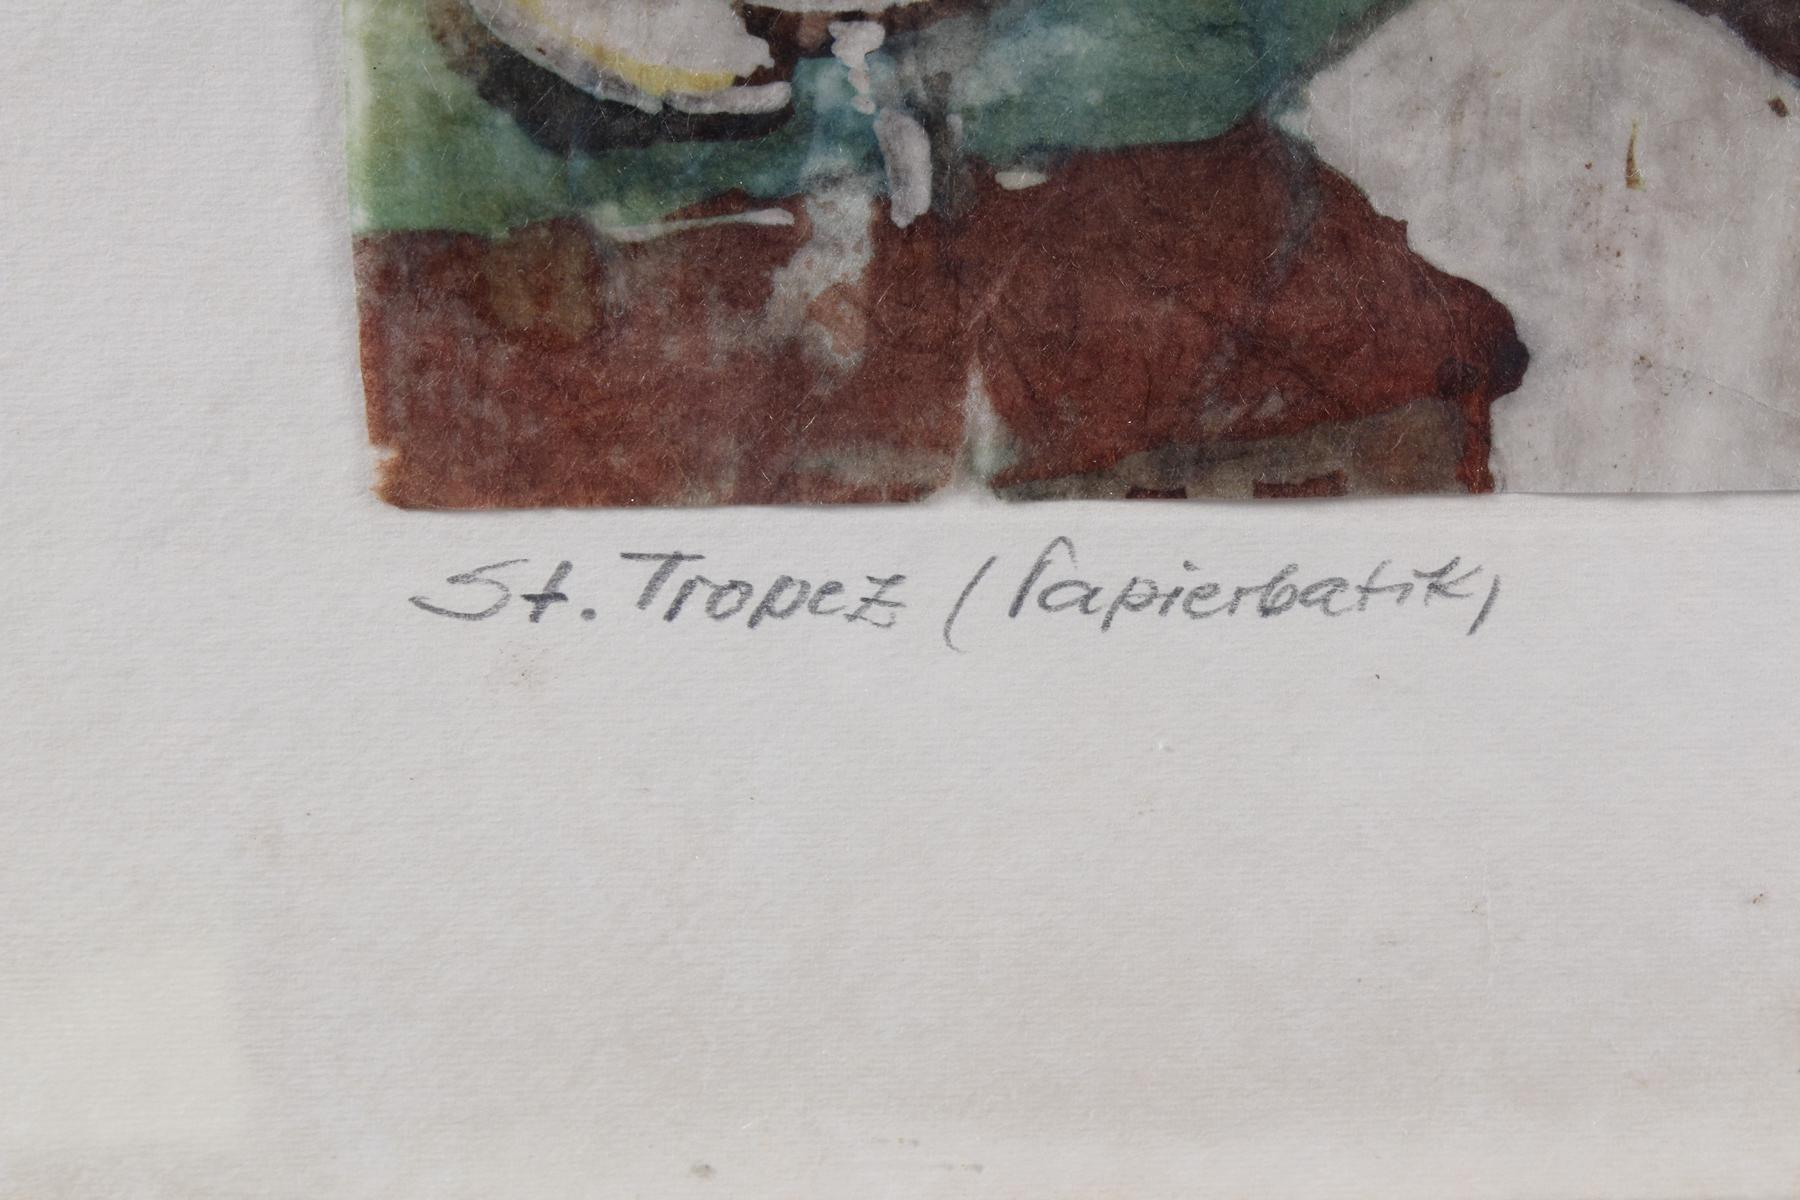 Eugen Pfeffer, St. Tropez, 1962-3